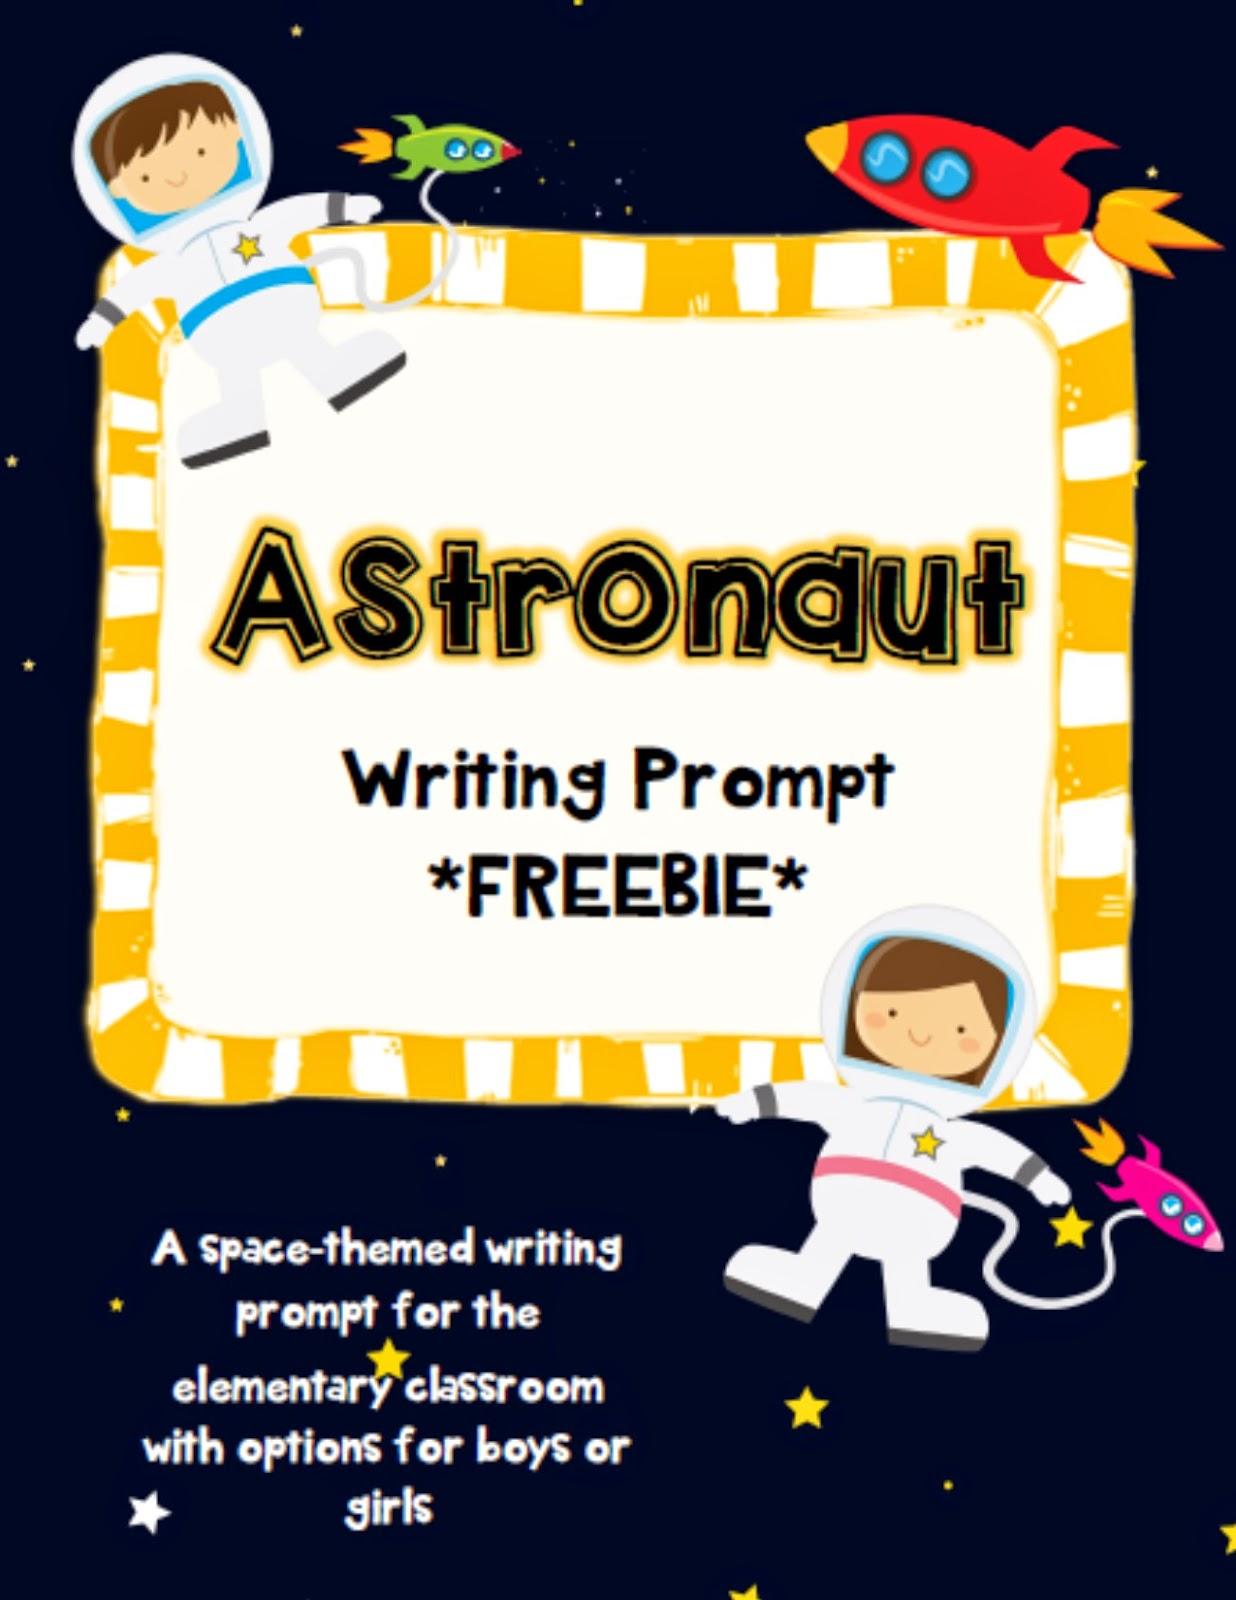 http://www.teacherspayteachers.com/Product/If-I-Was-An-Astronaut-writing-prompt-freebie-1412318